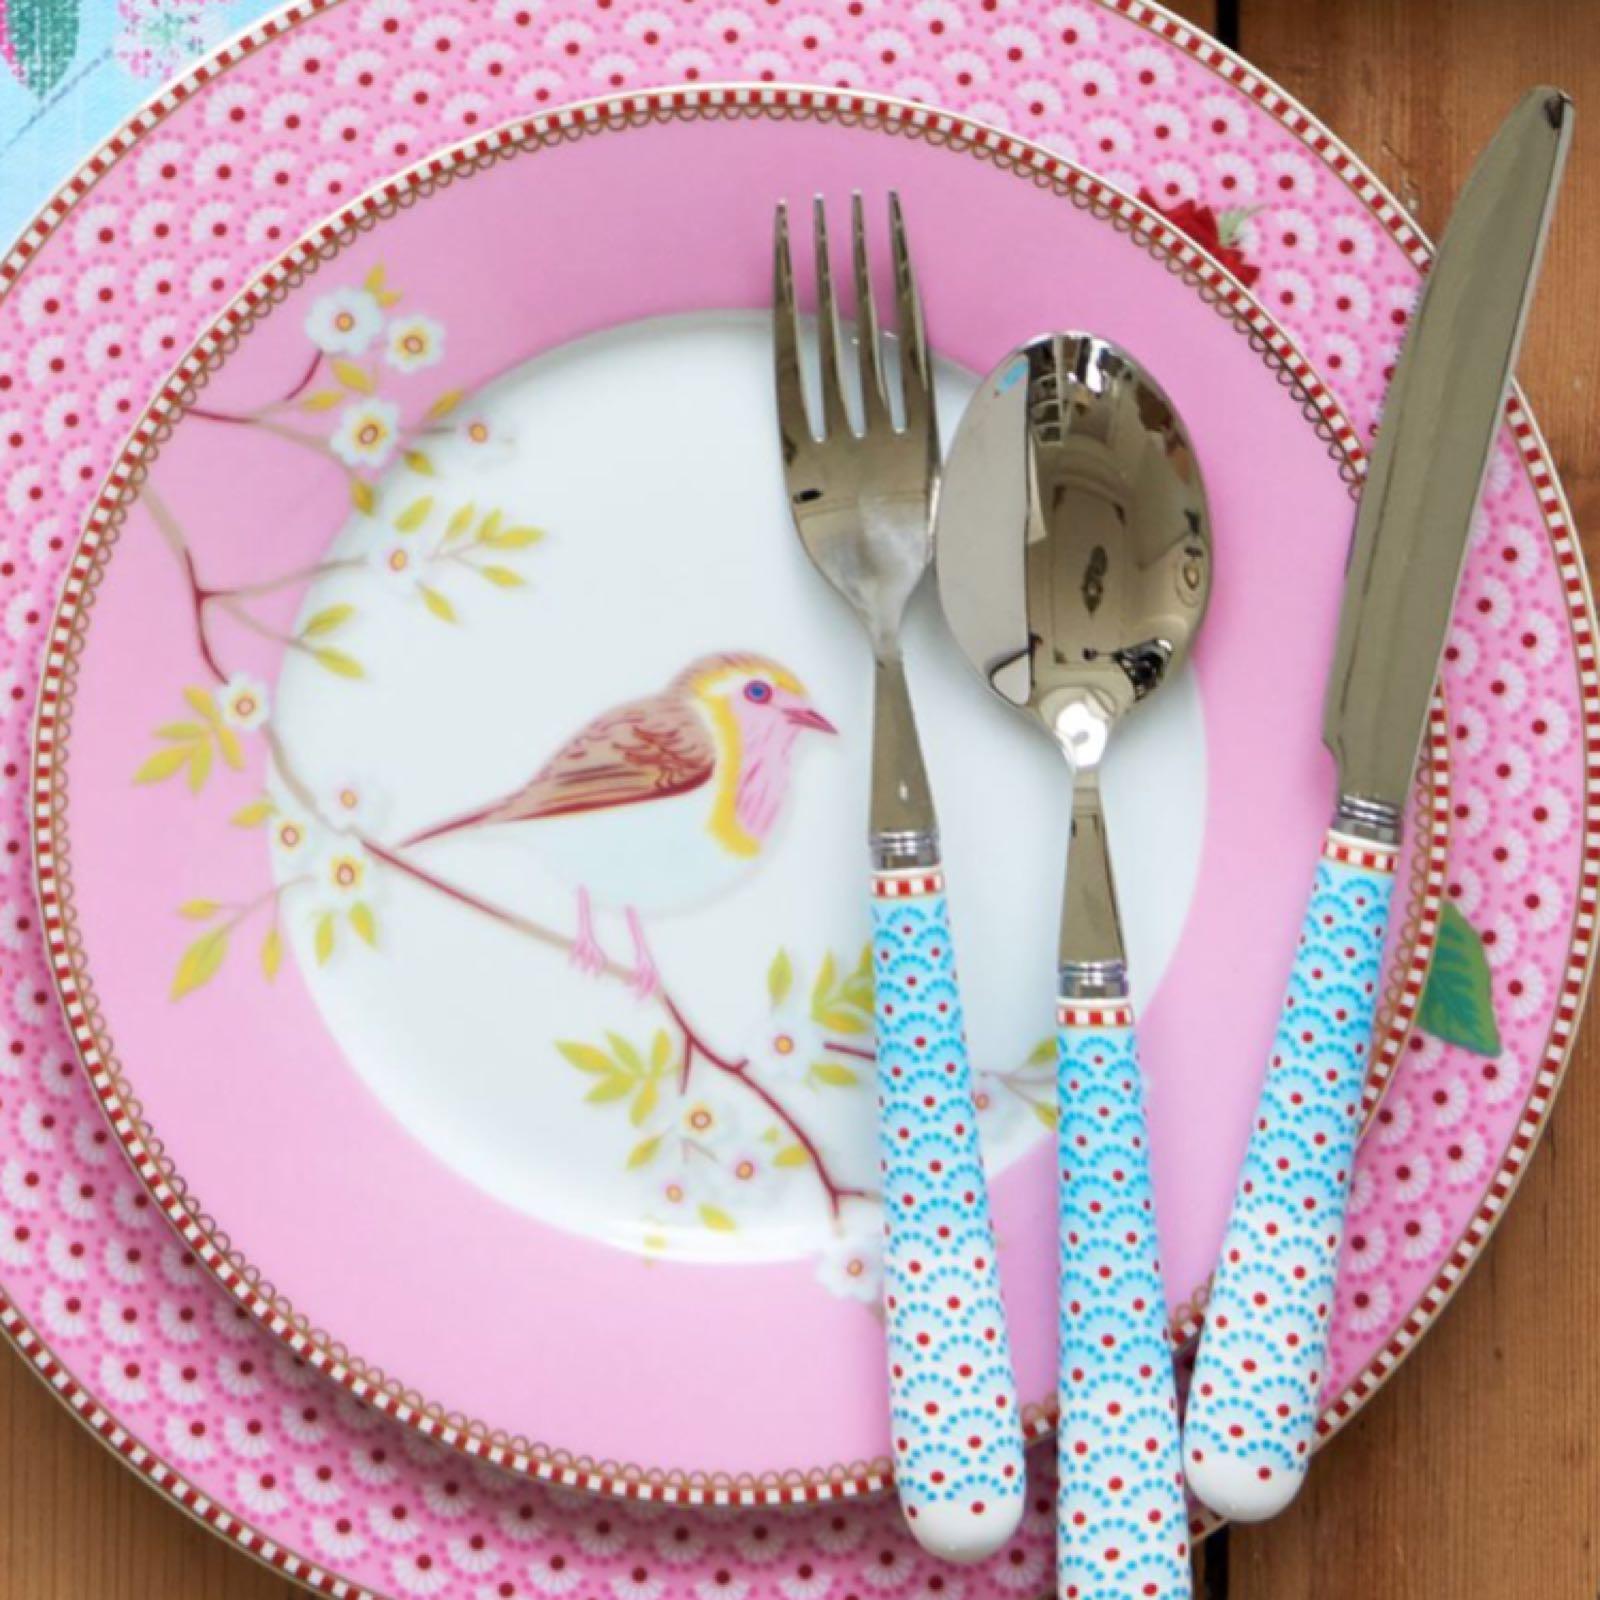 Pip studio cutlery set